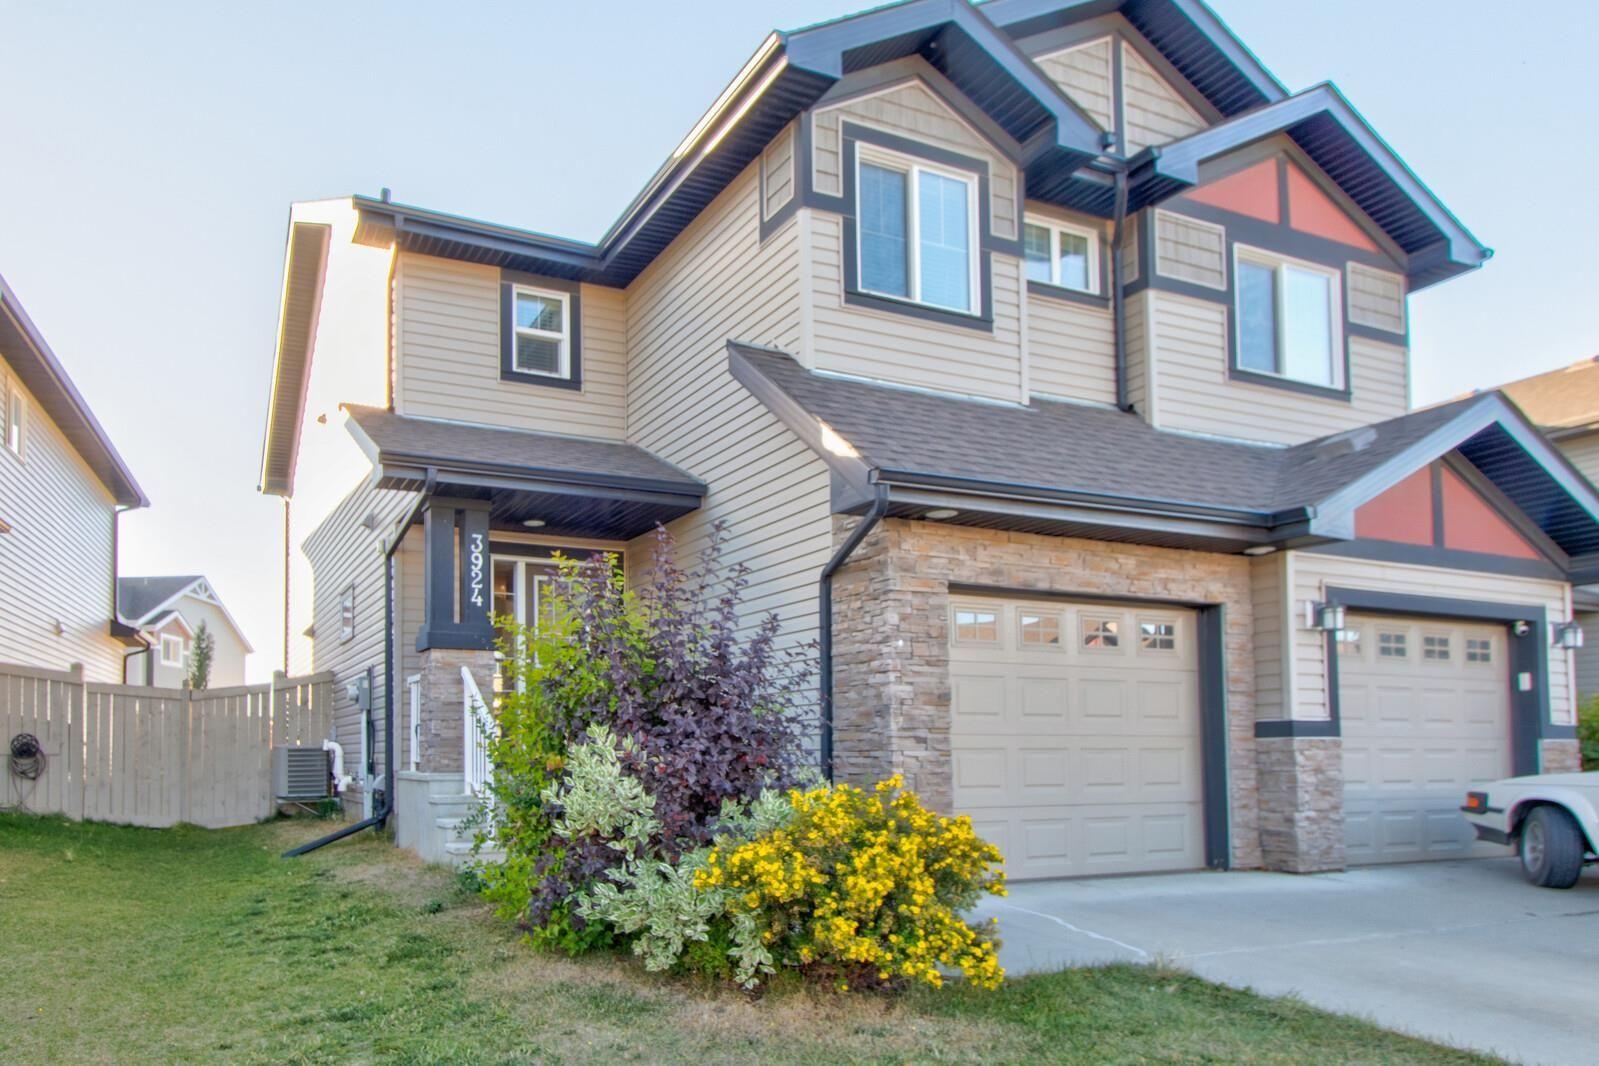 Main Photo: 3924 6 Street in Edmonton: Zone 30 House Half Duplex for sale : MLS®# E4264000